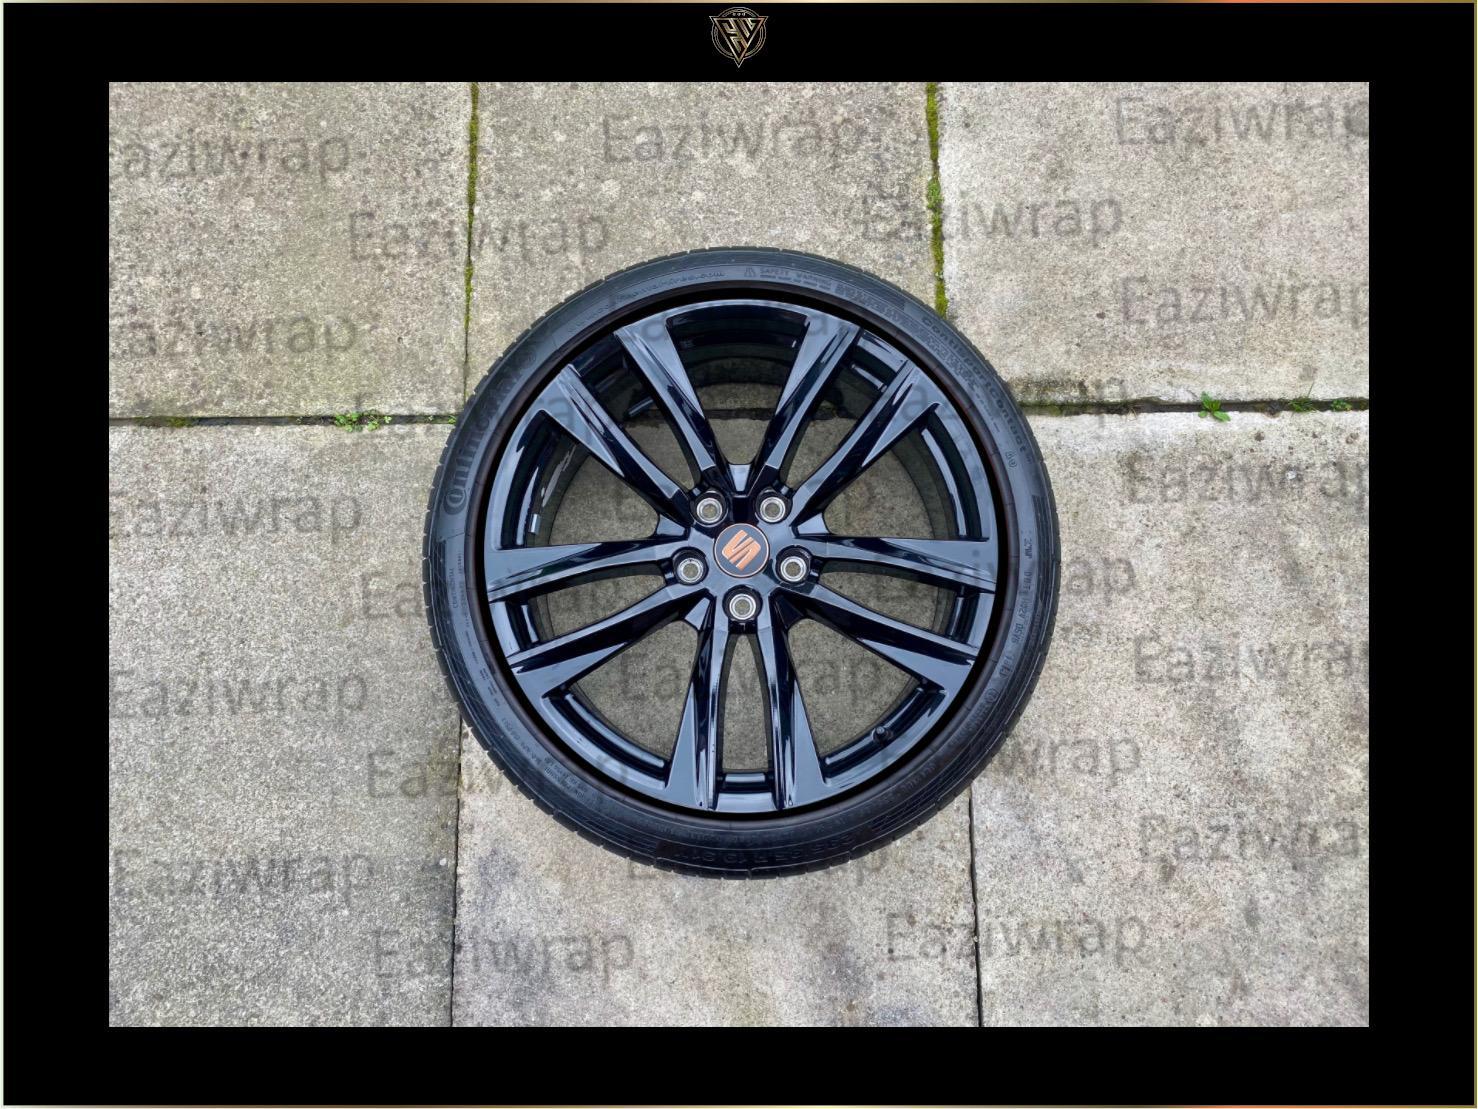 Eaziwrap Seat Leon Cupra MK3.5 Steering Wheel Vinyl /& Pinstripe Decal COPPER